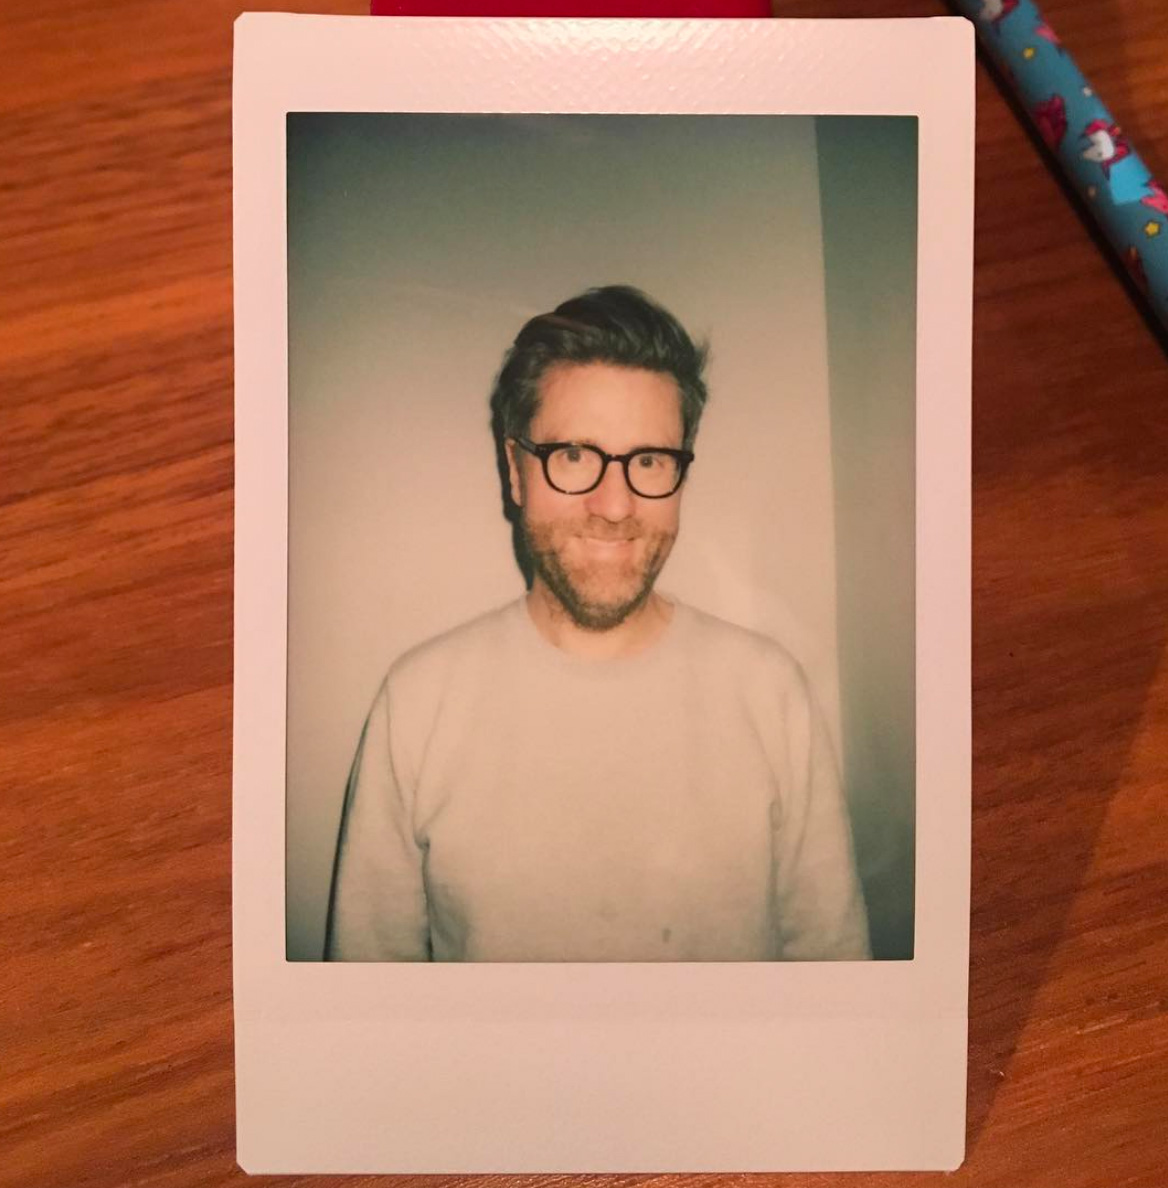 Martin Sjølie (Instagram/martinsjolie)